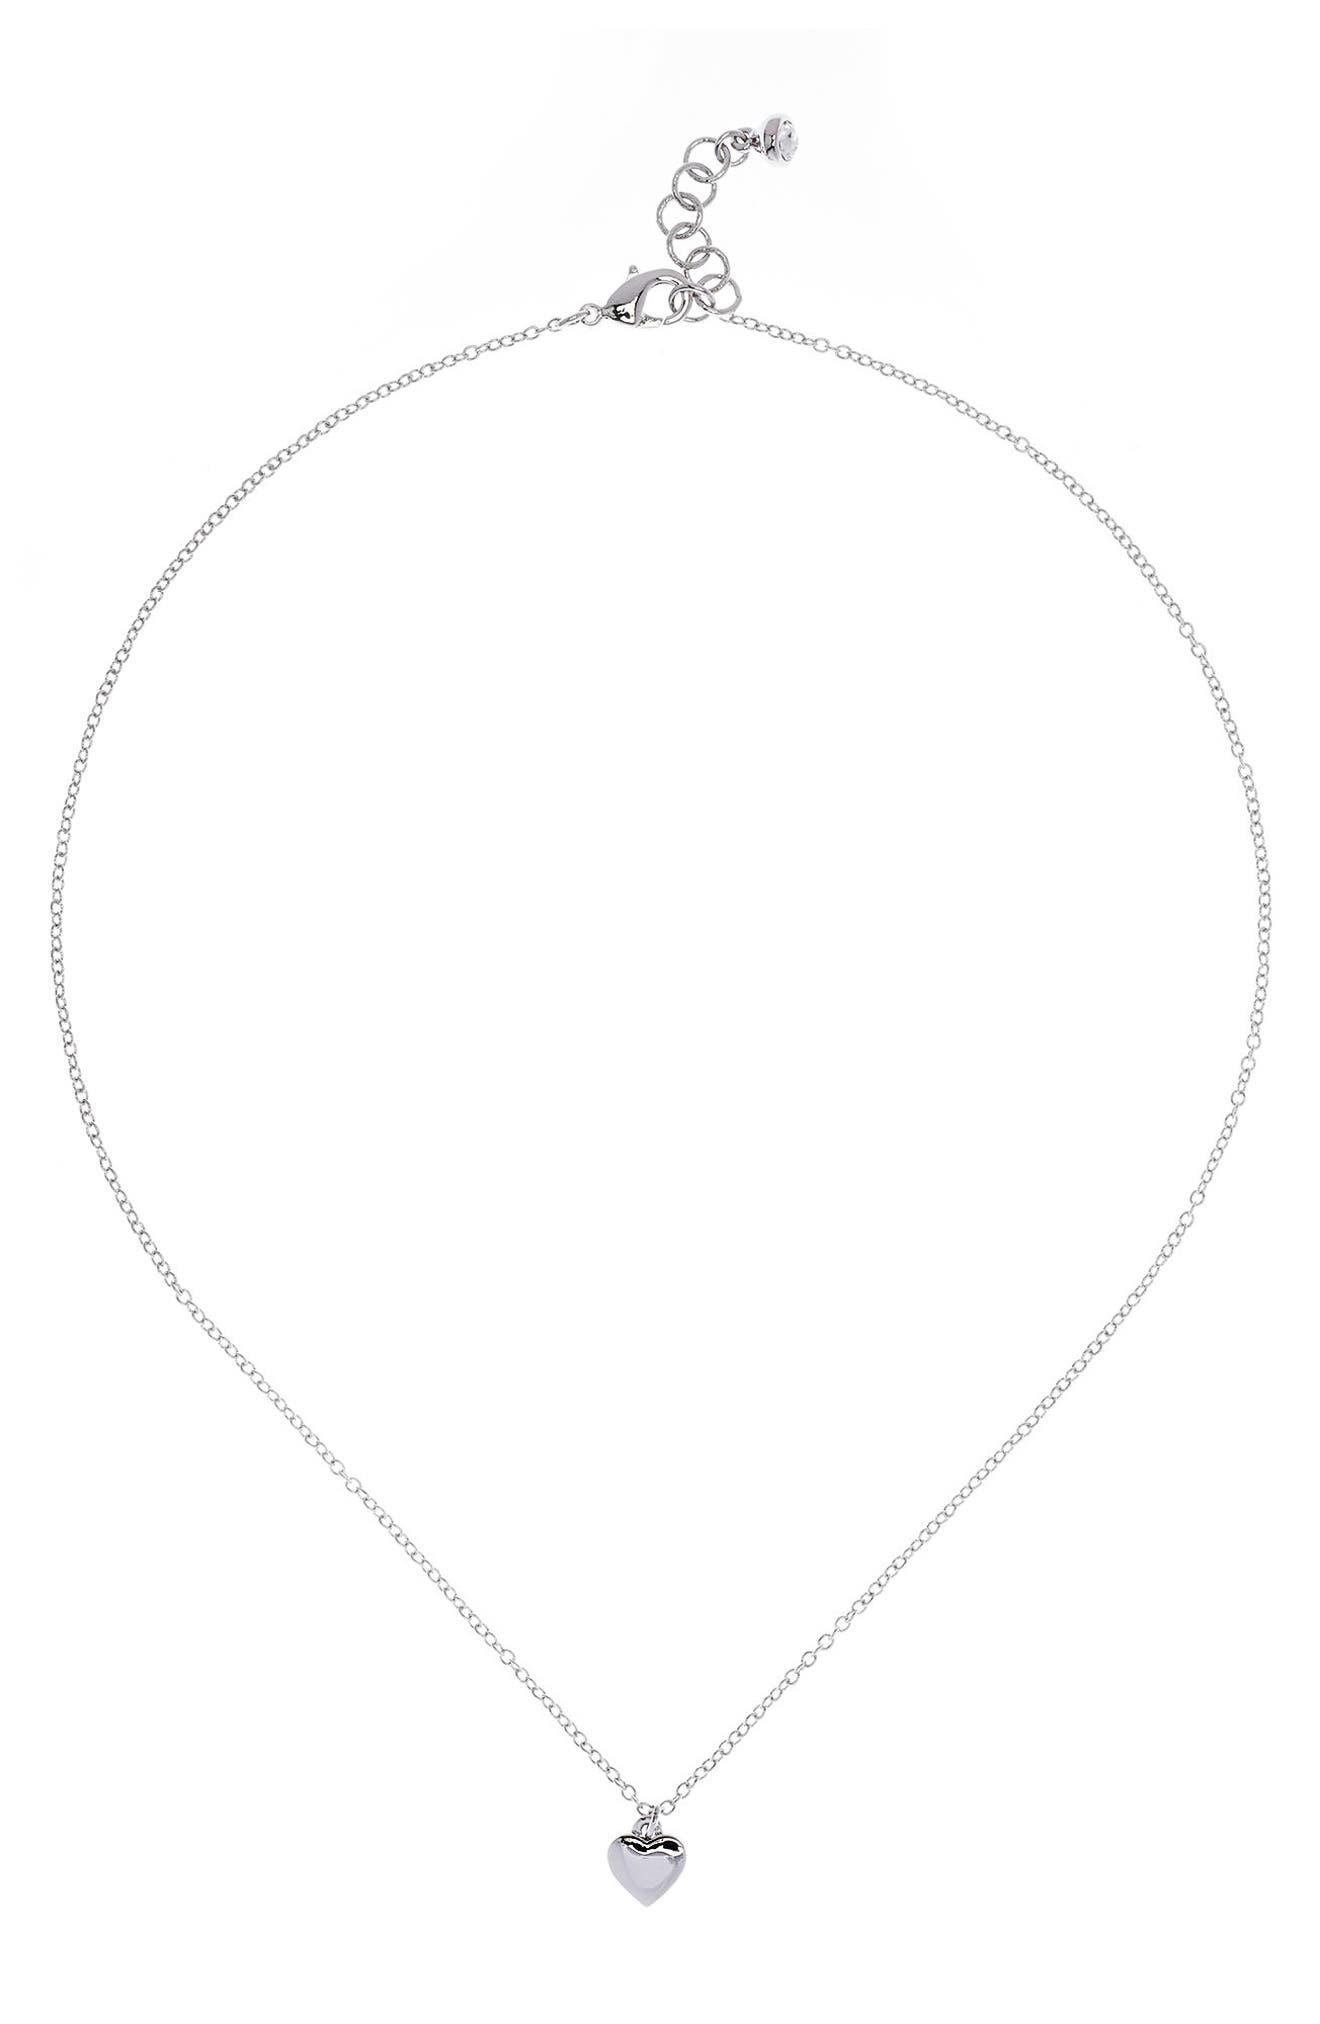 Mini Heart Pendant Necklace,                             Alternate thumbnail 2, color,                             040